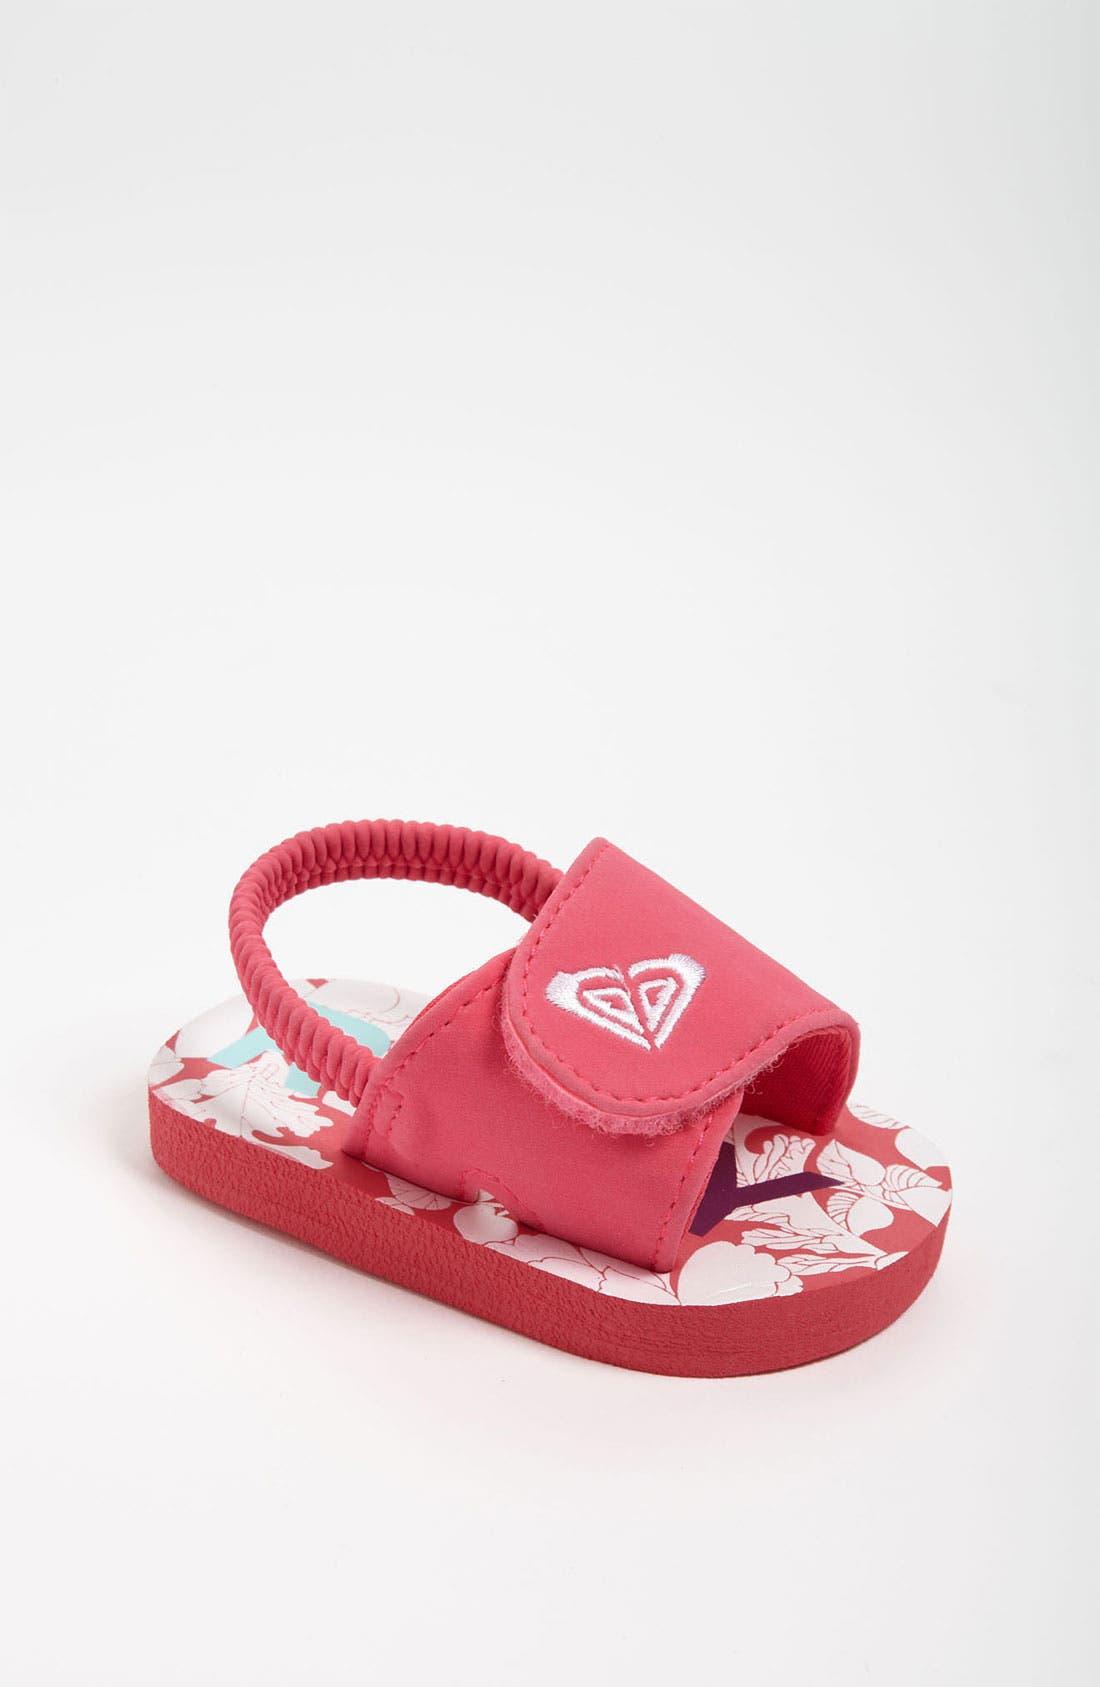 Alternate Image 1 Selected - 'Tip Toe II' Sandal (Baby)